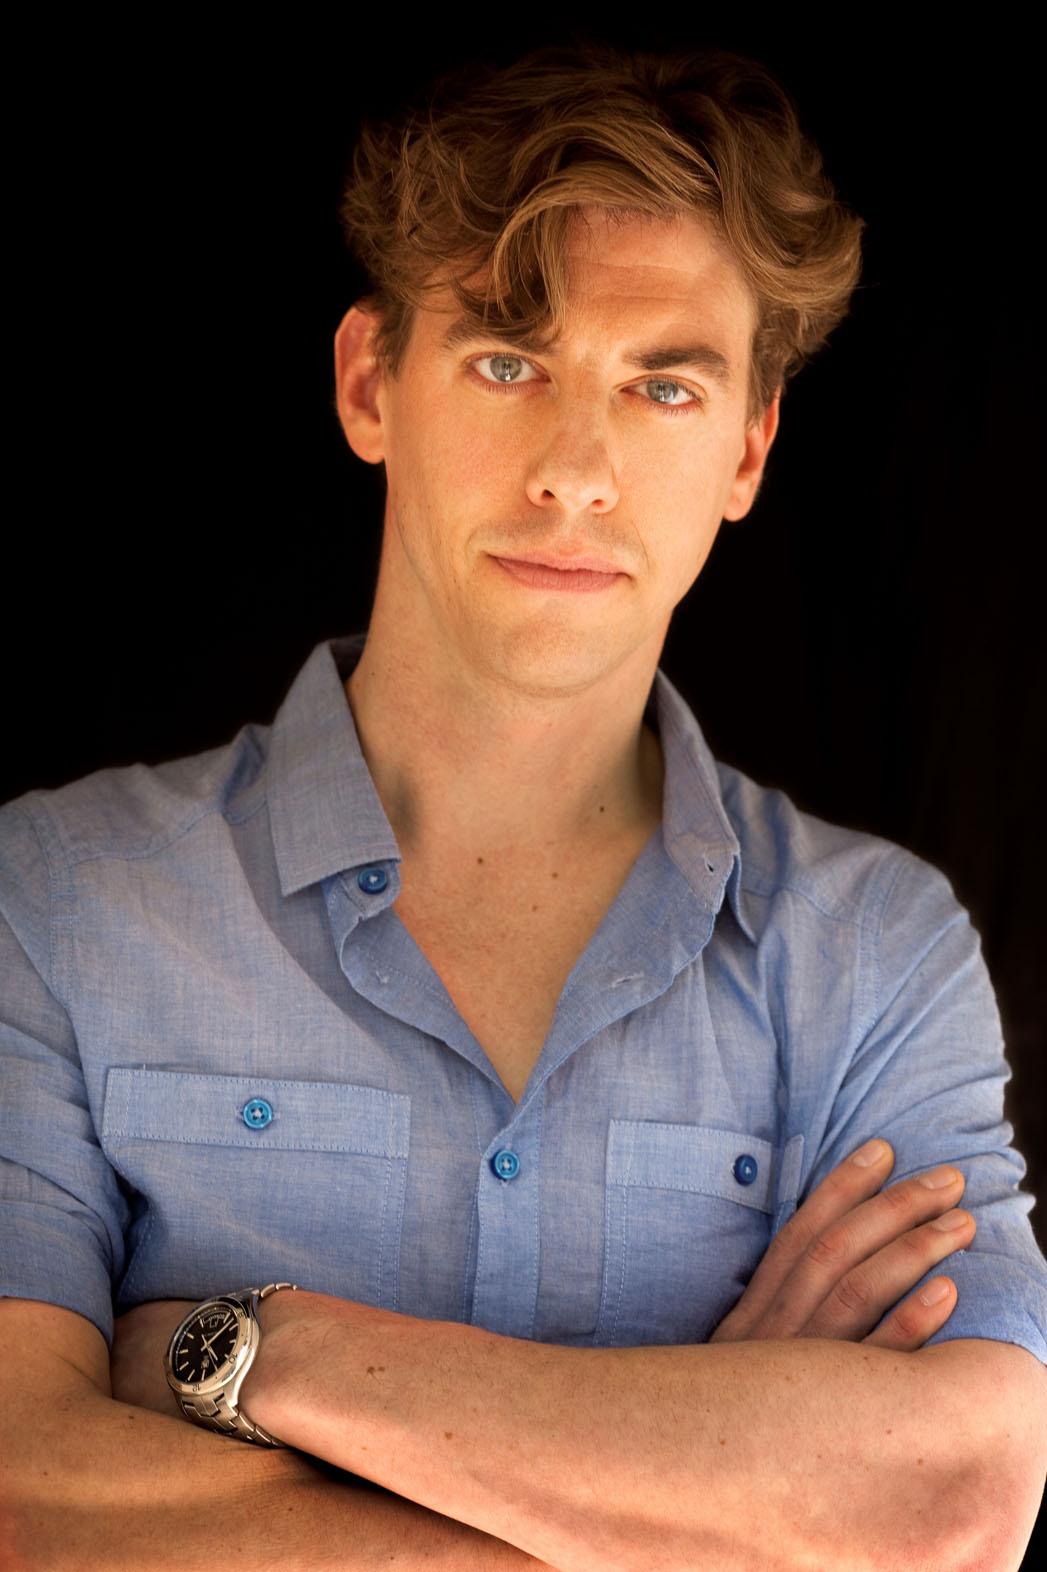 Christian Borle Headshot - P 2014